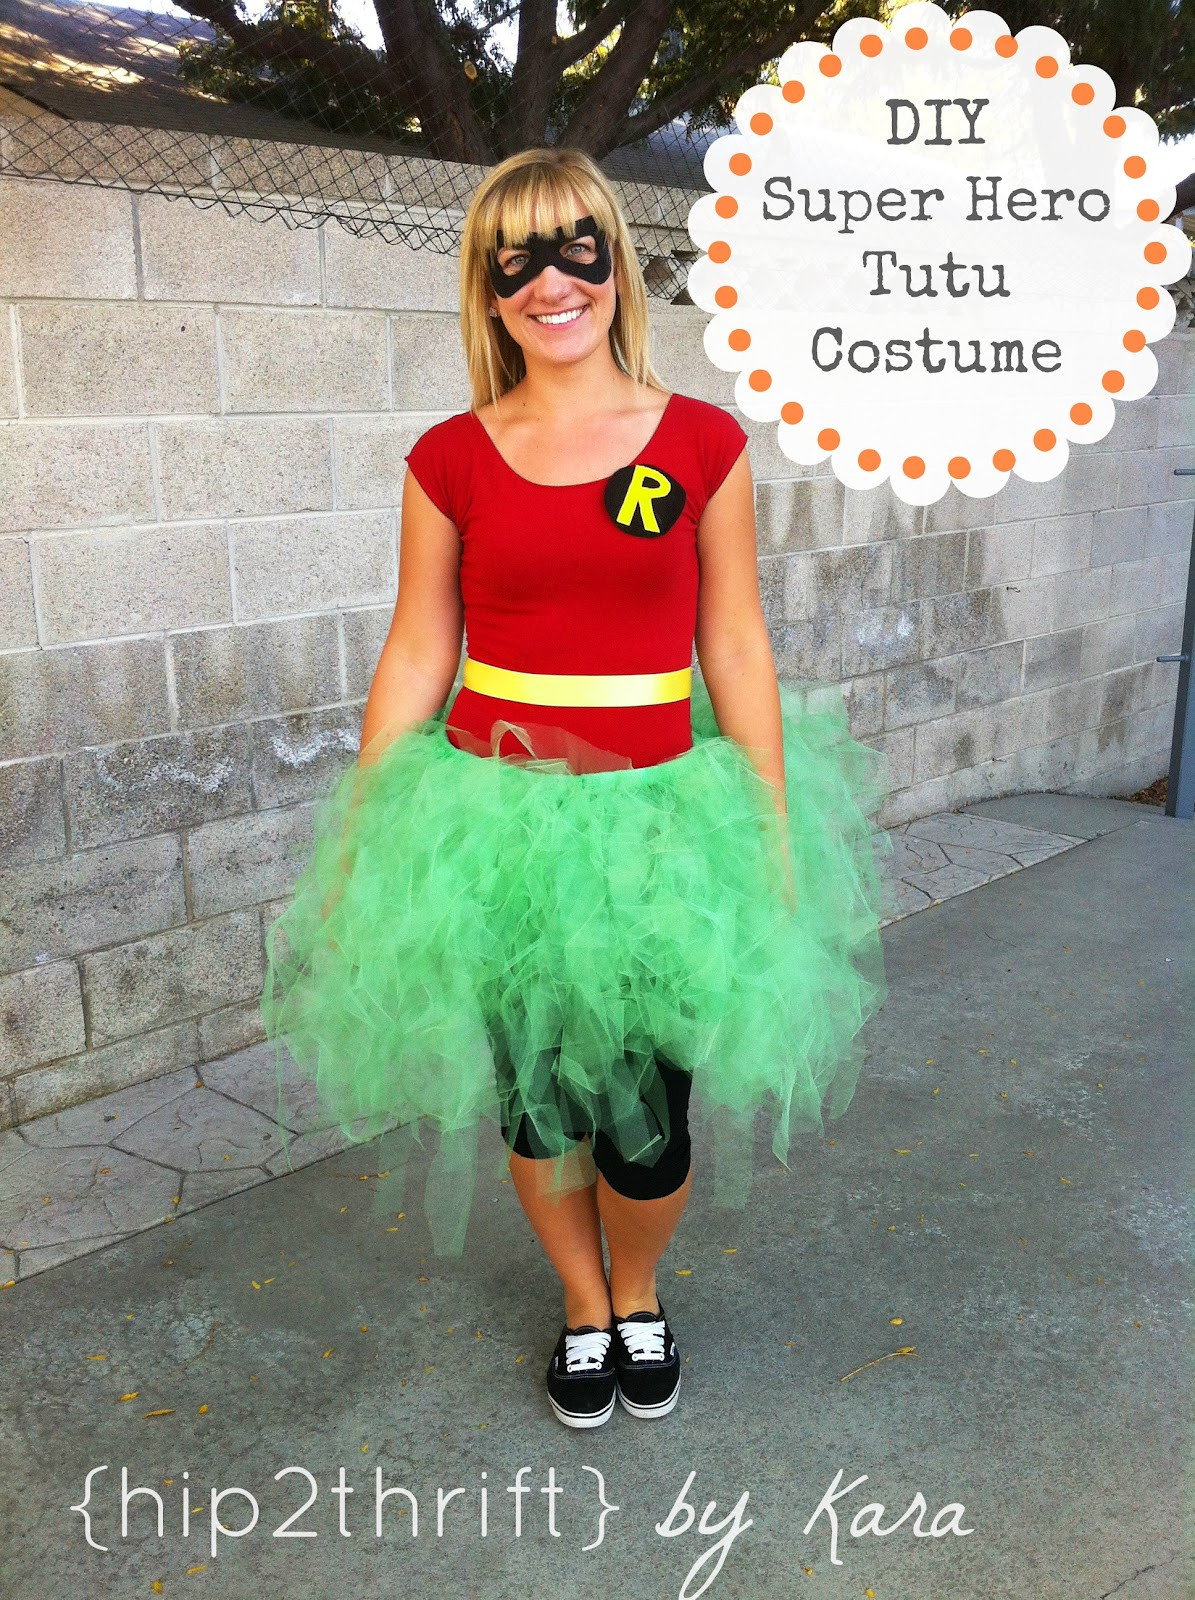 Best ideas about Superhero DIY Costume . Save or Pin hip2thrift DIY Super Hero Tutu Costumes Now.